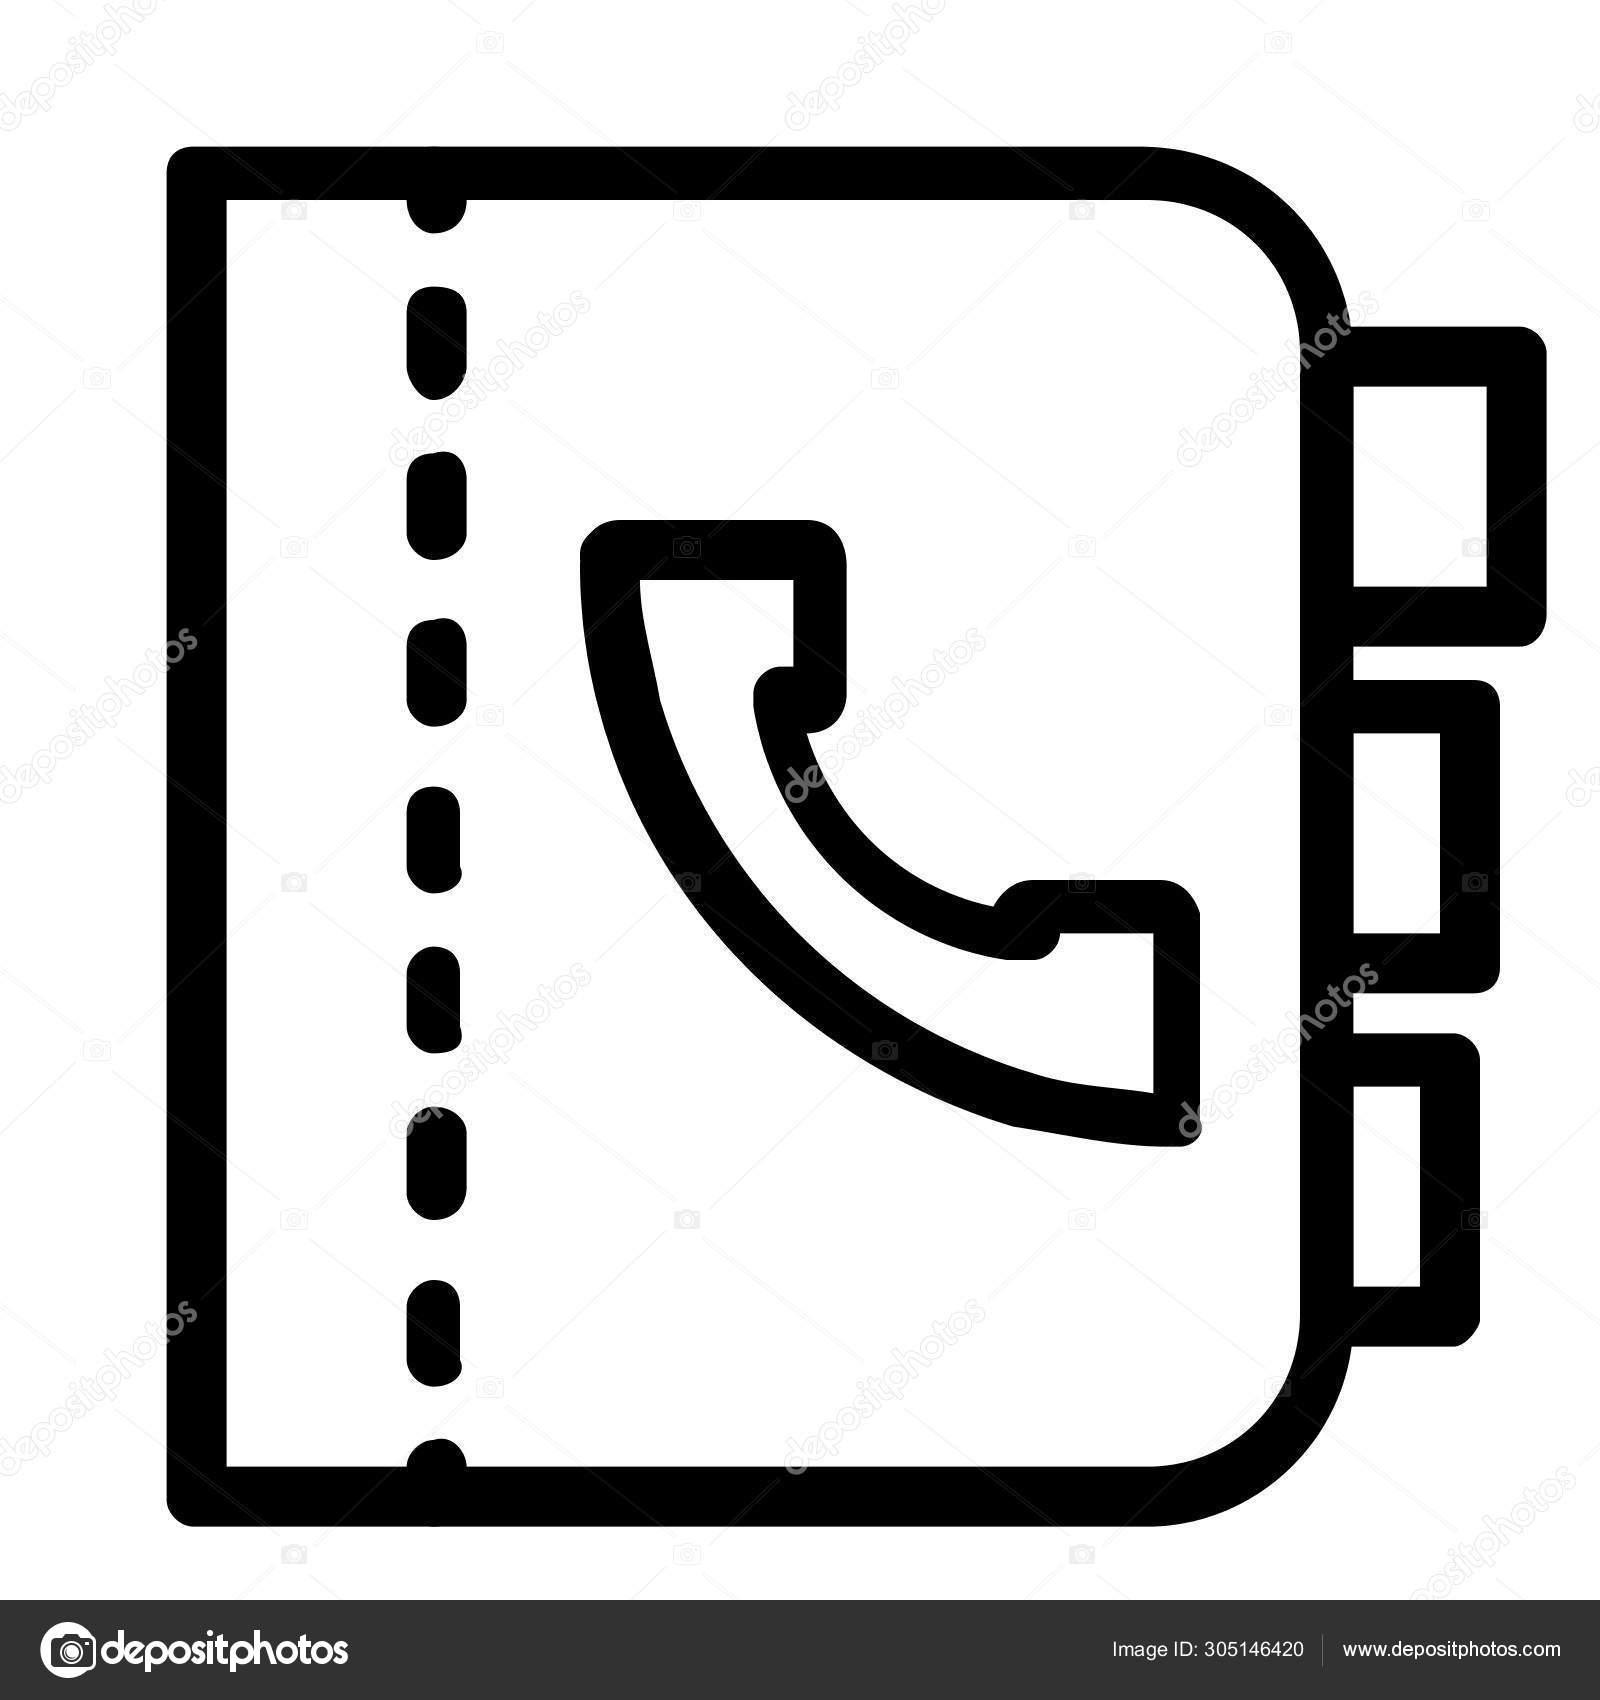 Kontaktbuch Einfache Illustration Vektorgrafik Lizenzfreie Grafiken C Iconscout 305146420 Depositphotos